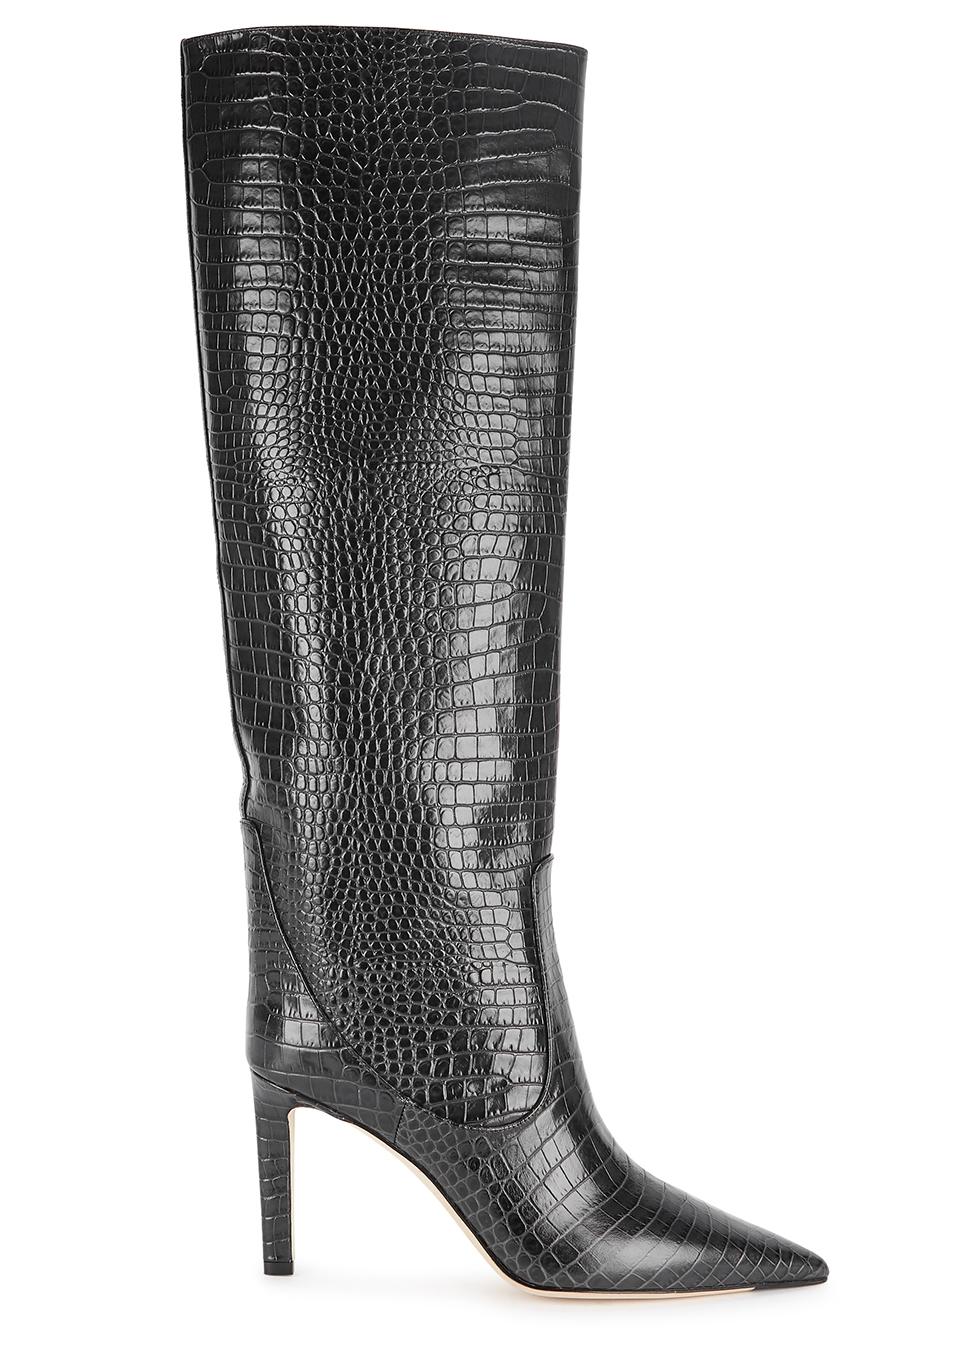 PerfumeShoesHeelsamp; Jimmy Choo Harvey Boots Nichols mN80vnw